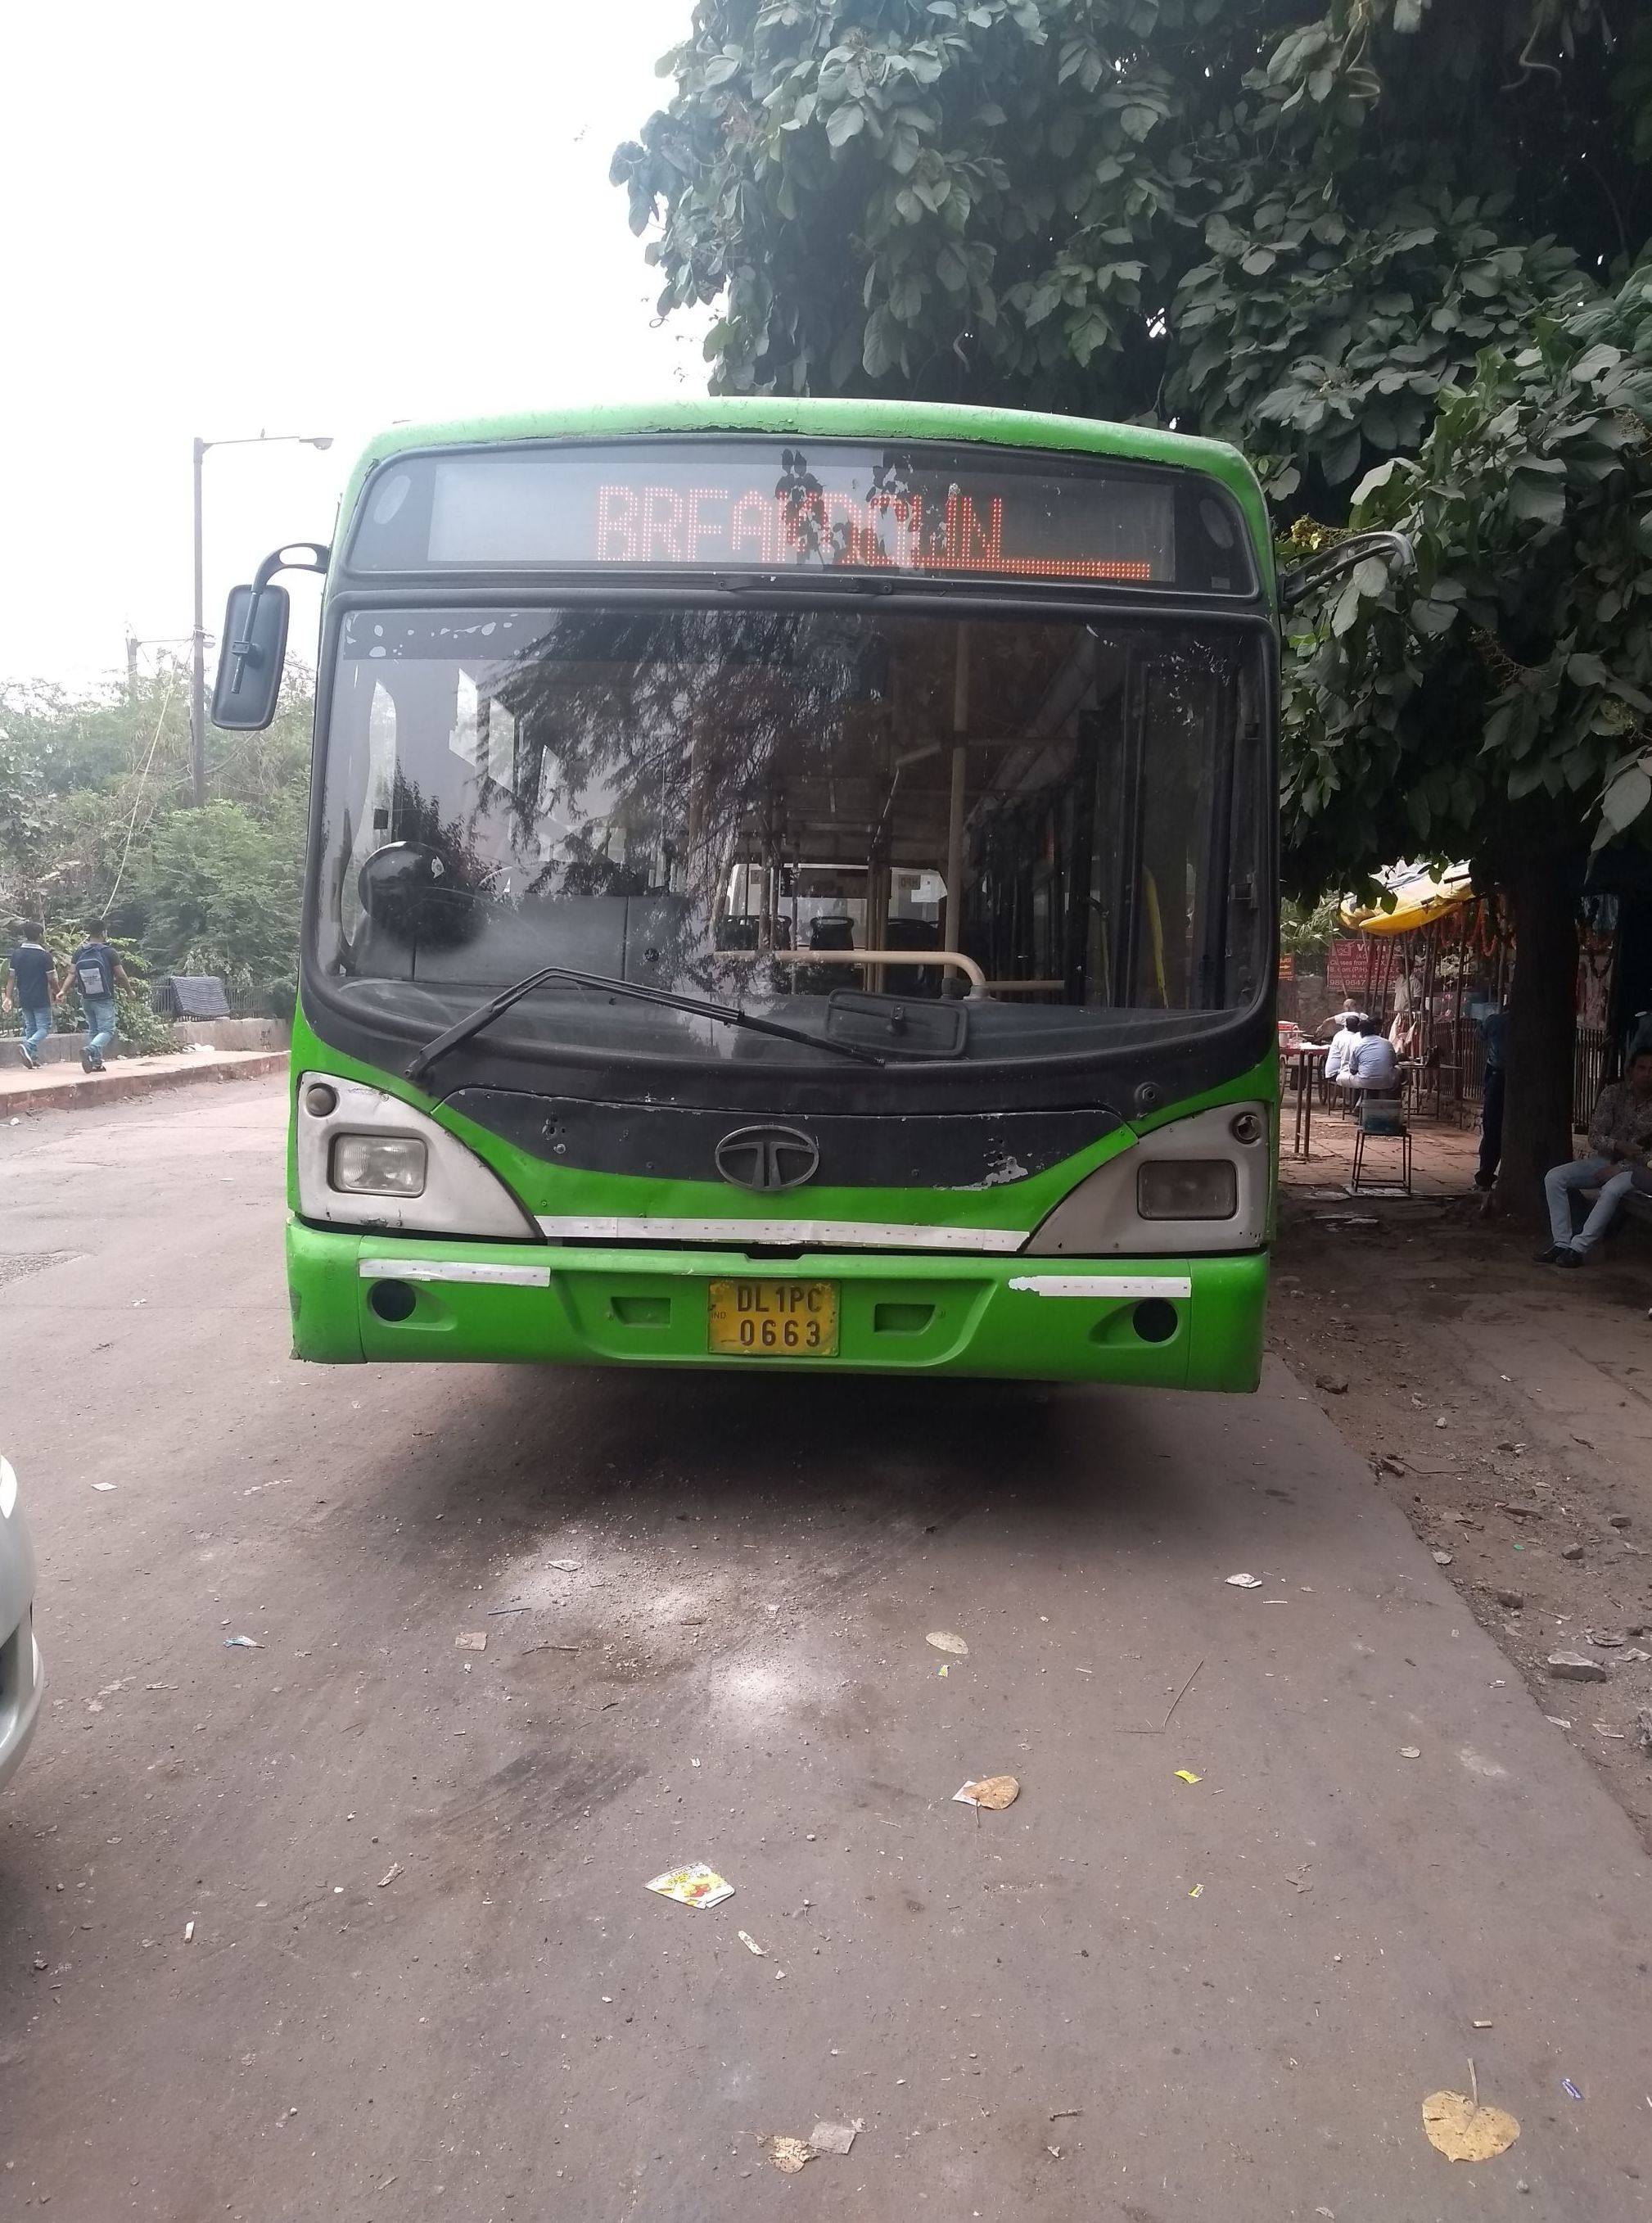 A broken down bus